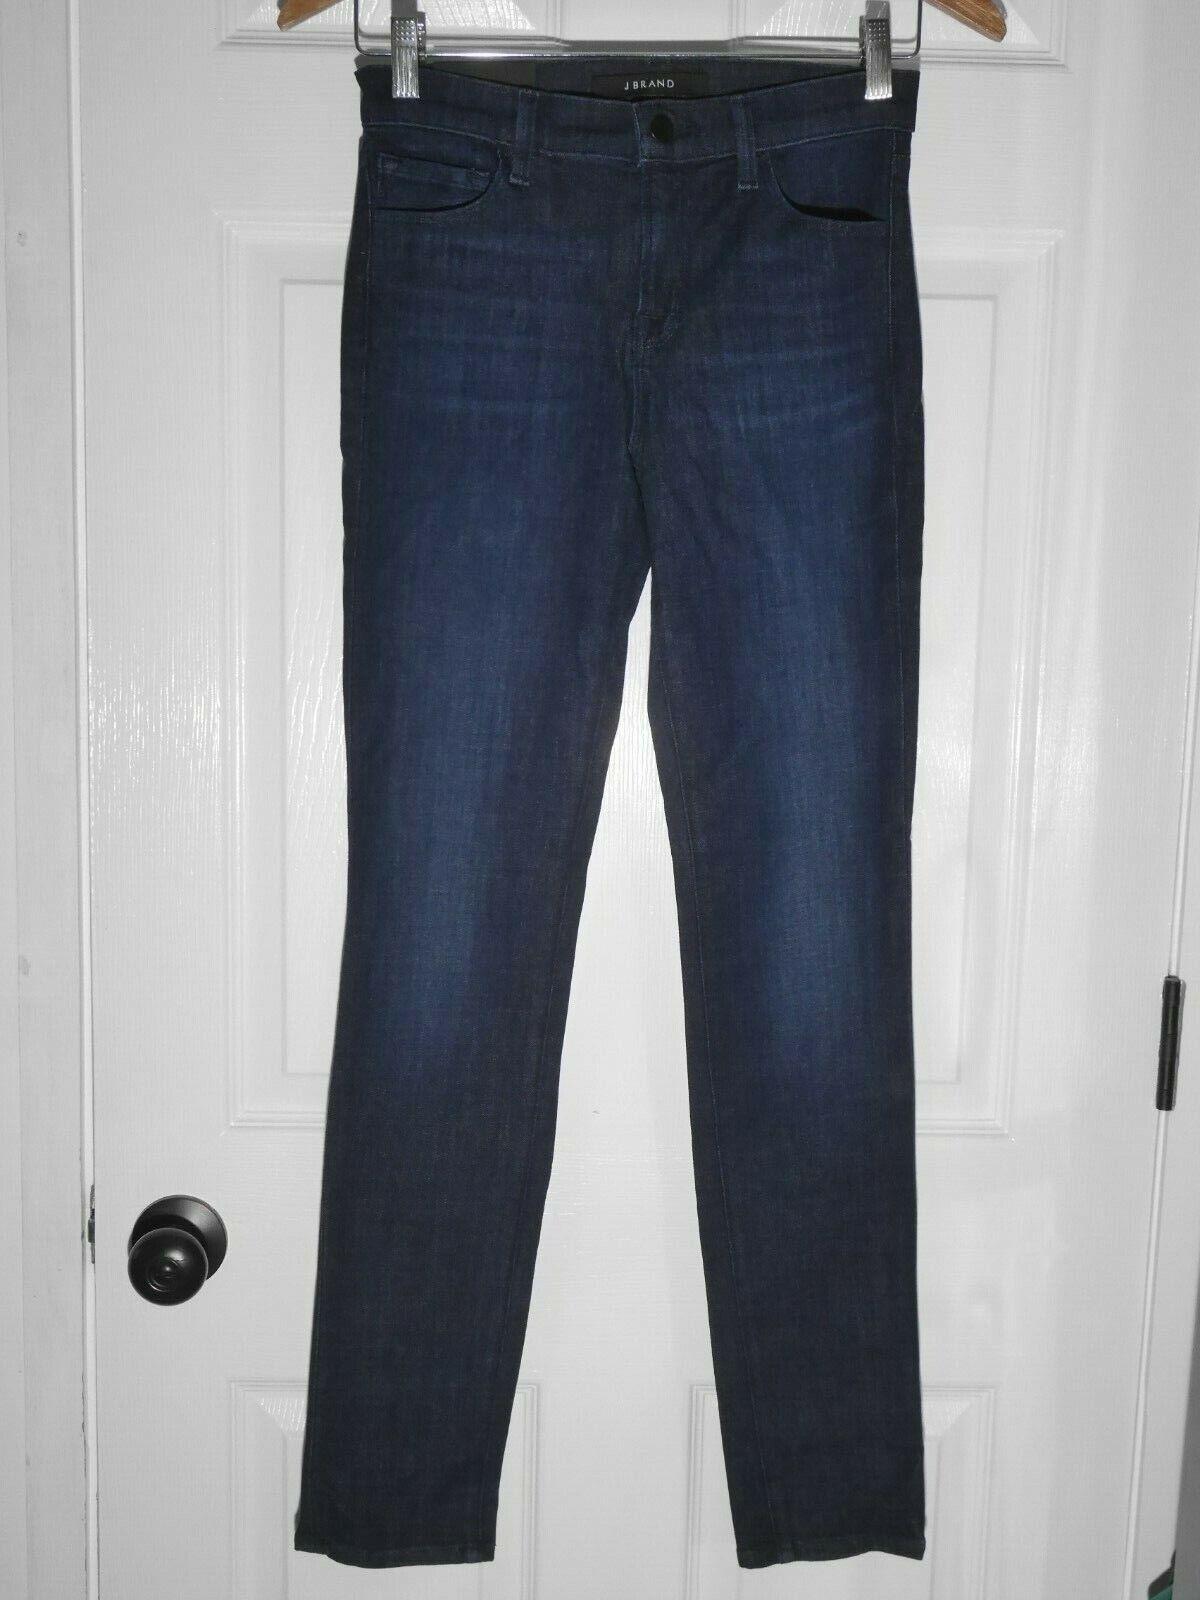 228 NEW J Brand Hi-Def Stretch Mid Rise Skinny Leg Jeans in Daring Dark Wash 26